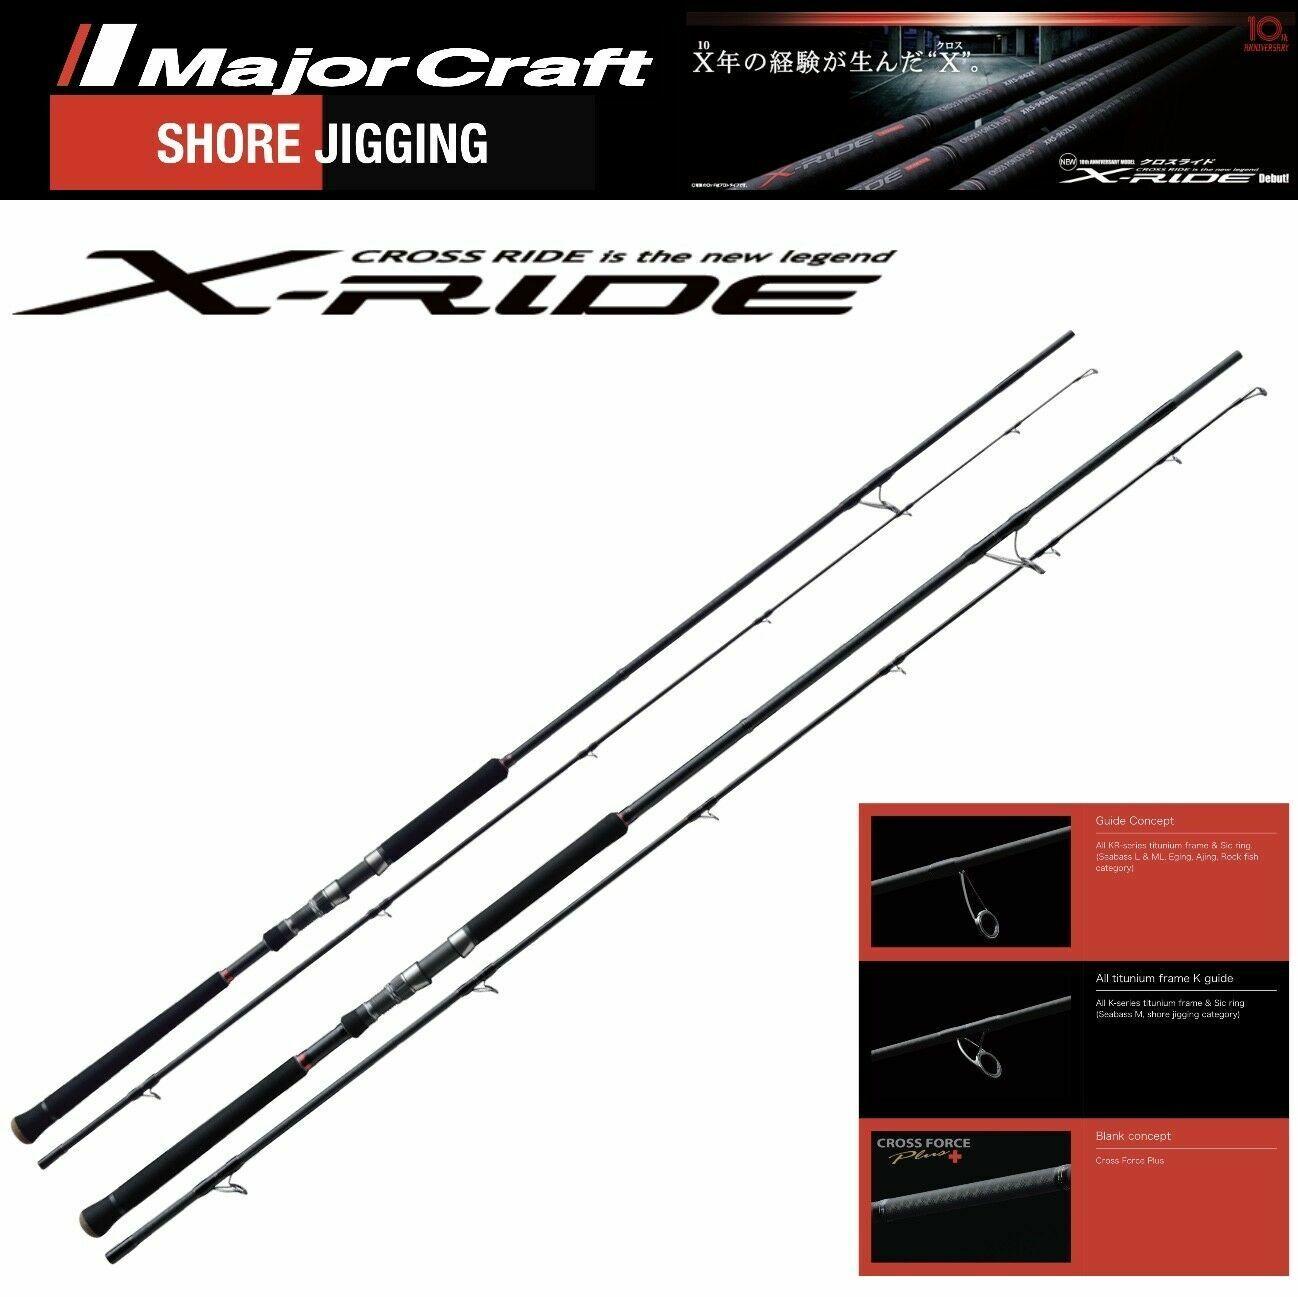 Major Craft premium shore jigging rod Model X-Ride